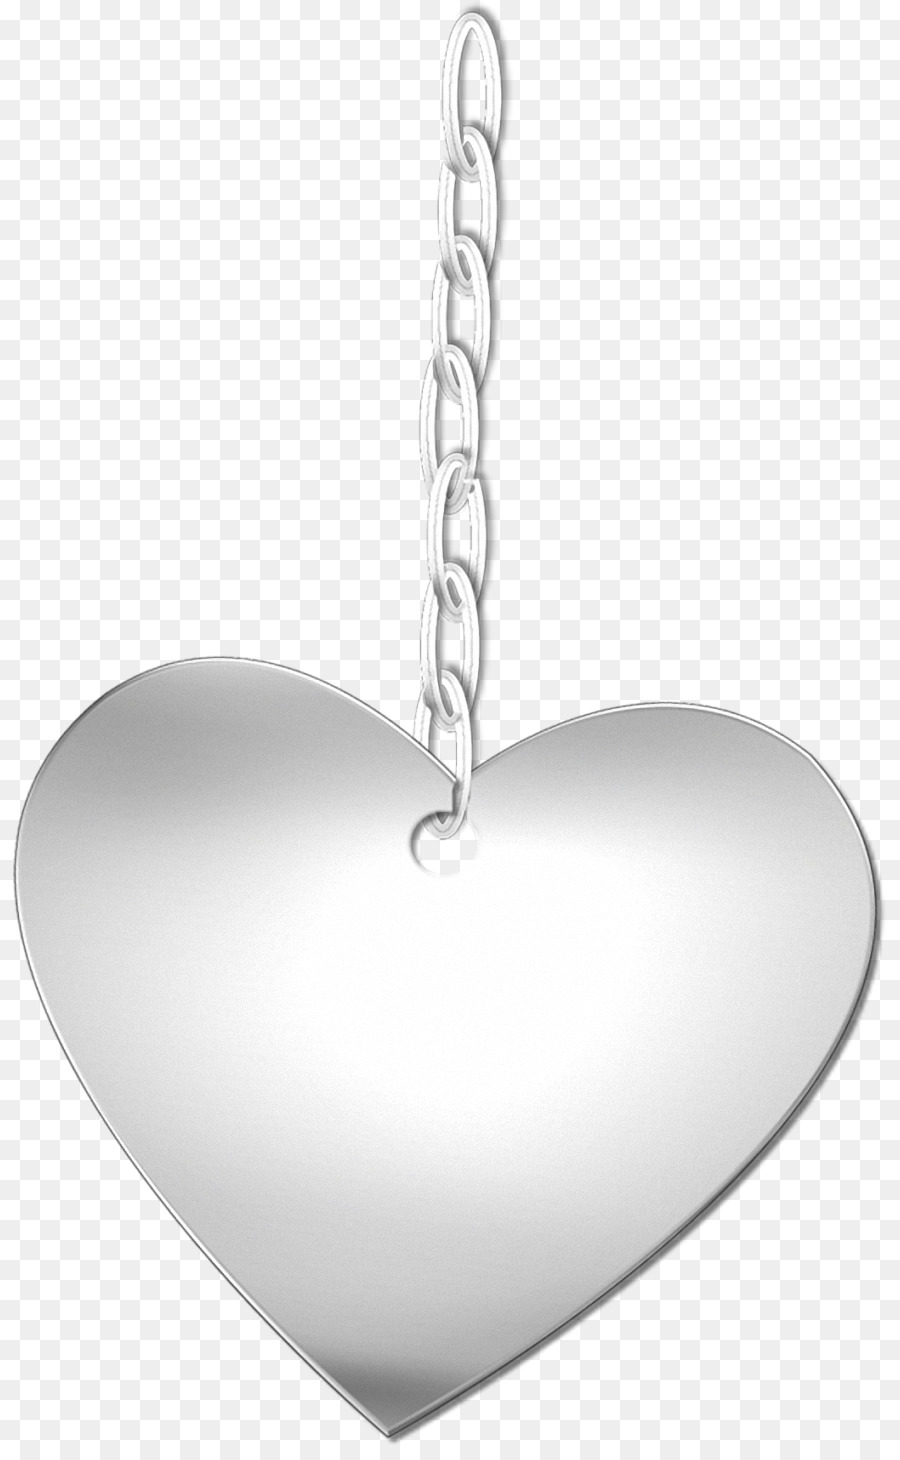 Сердечки картинка контур